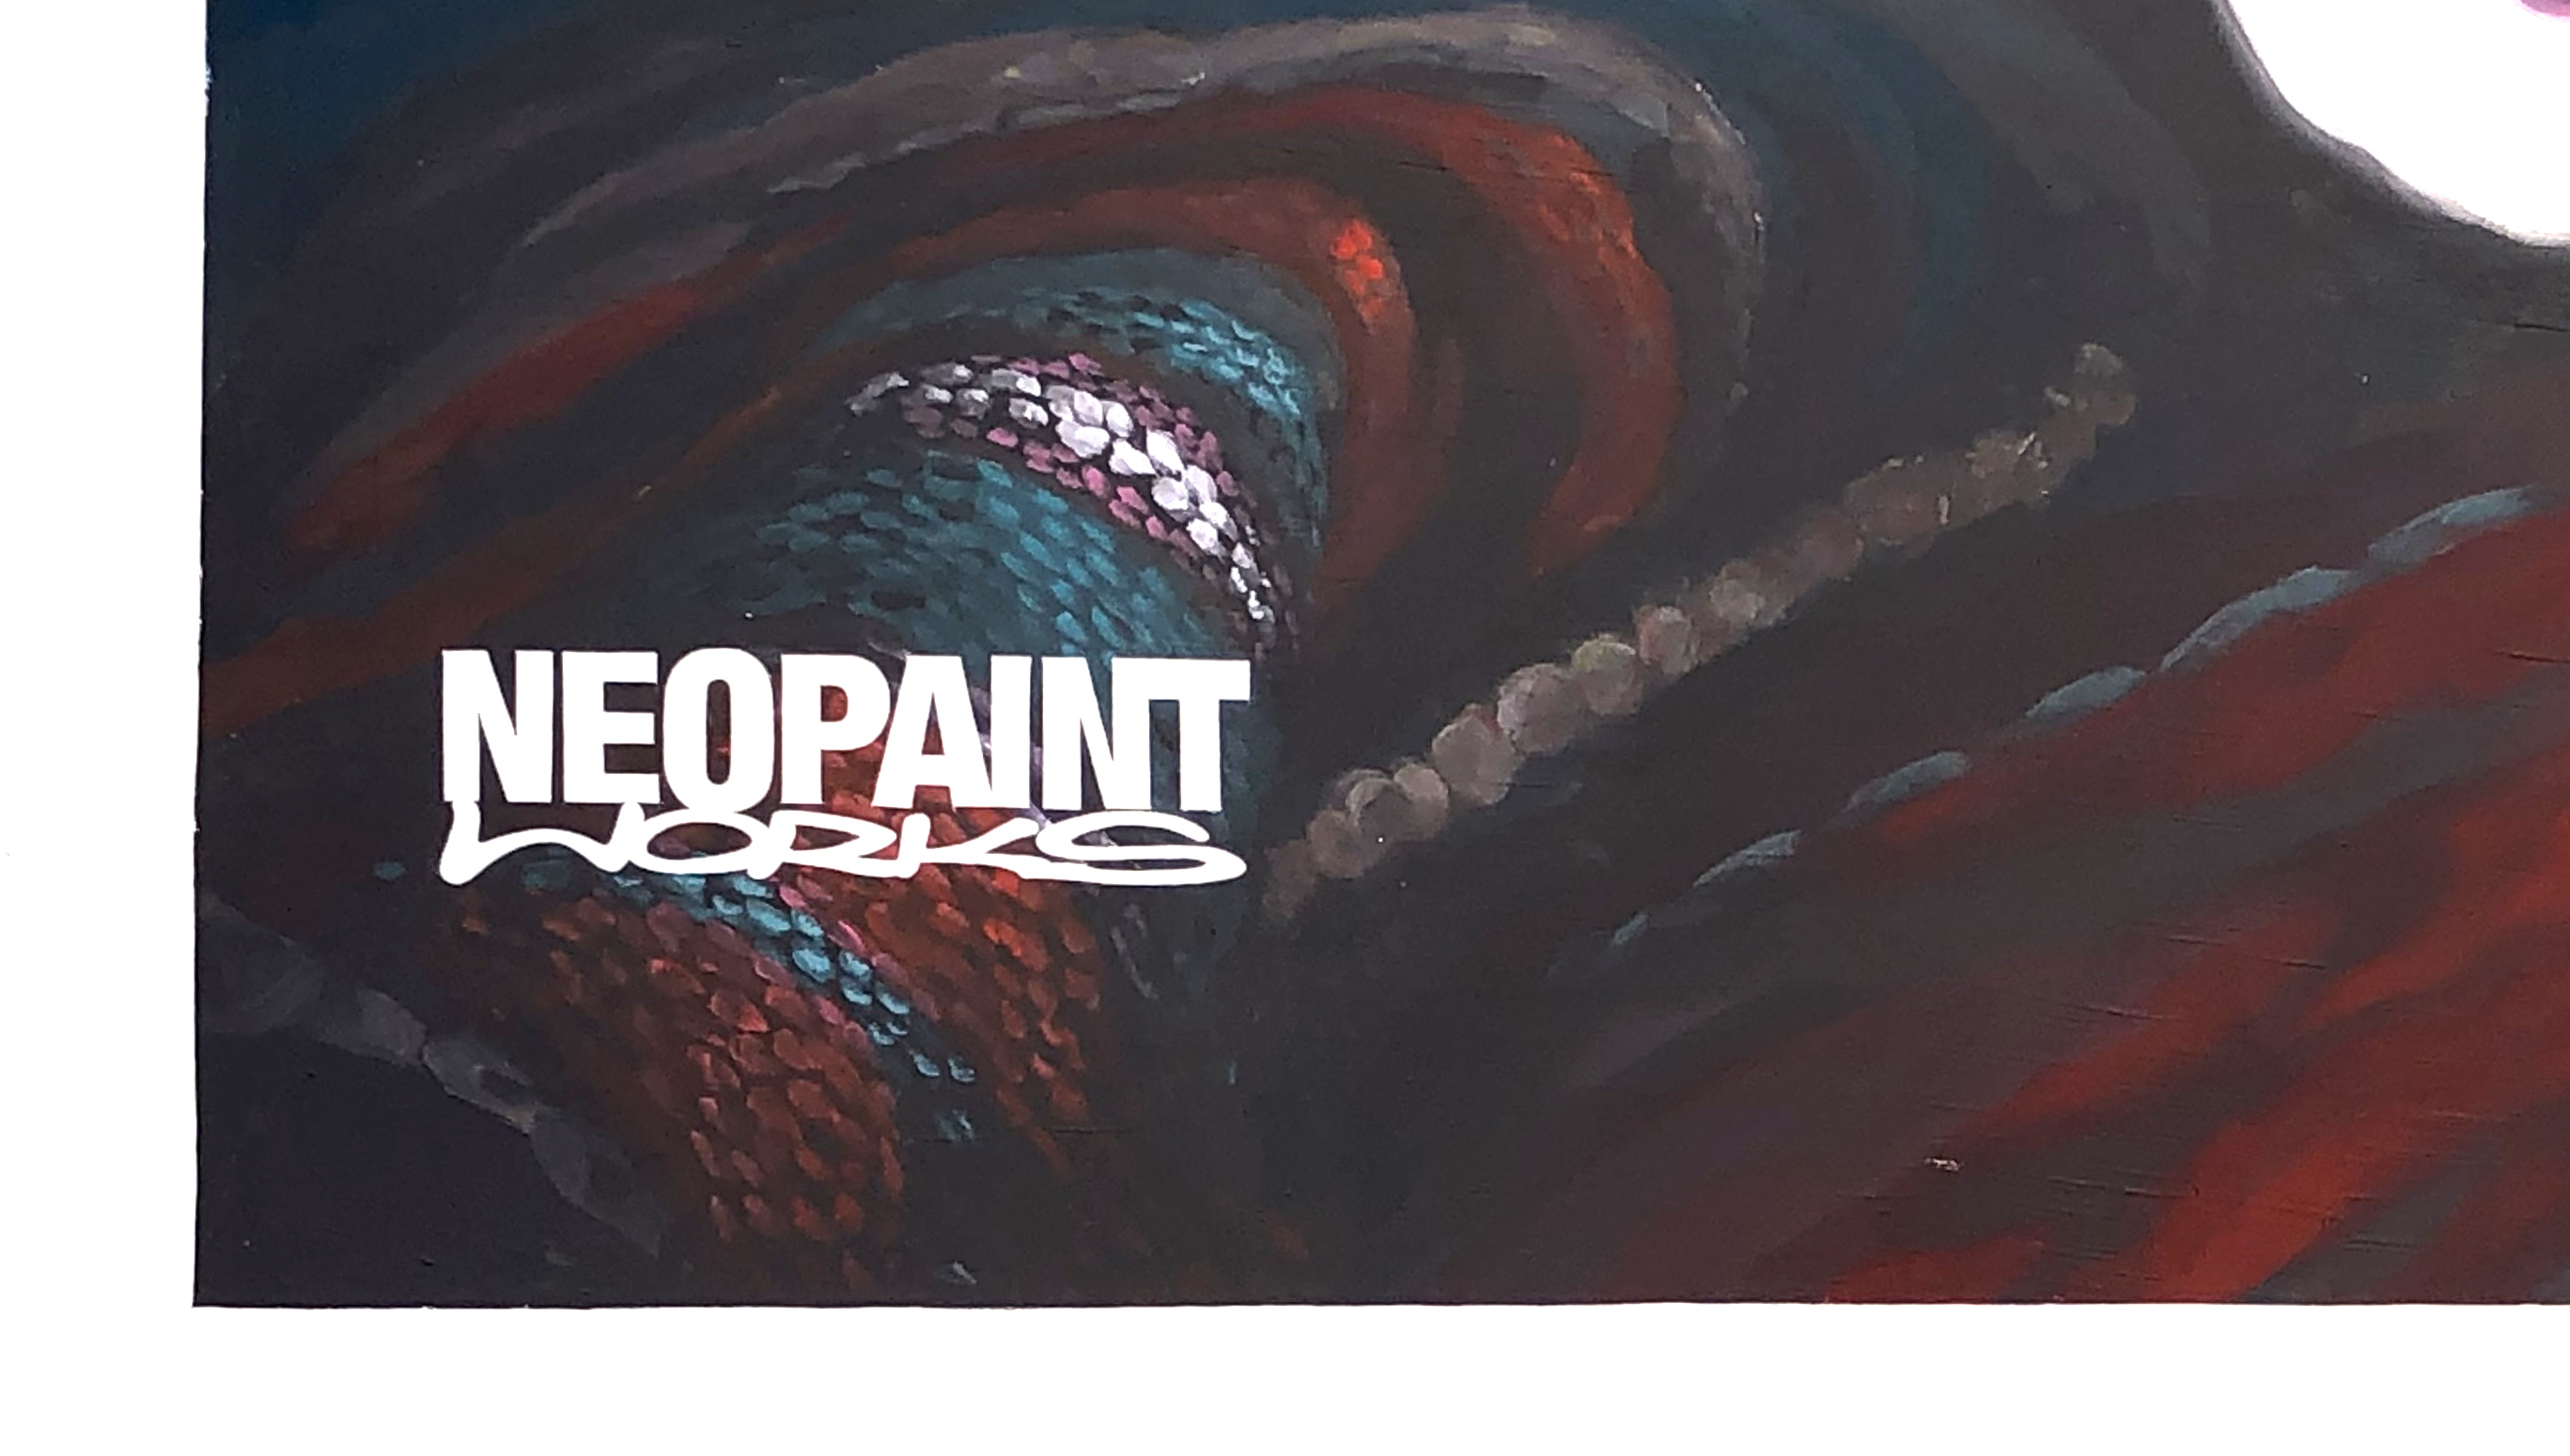 Tűzfalfestés - unhcr Neopaint Works